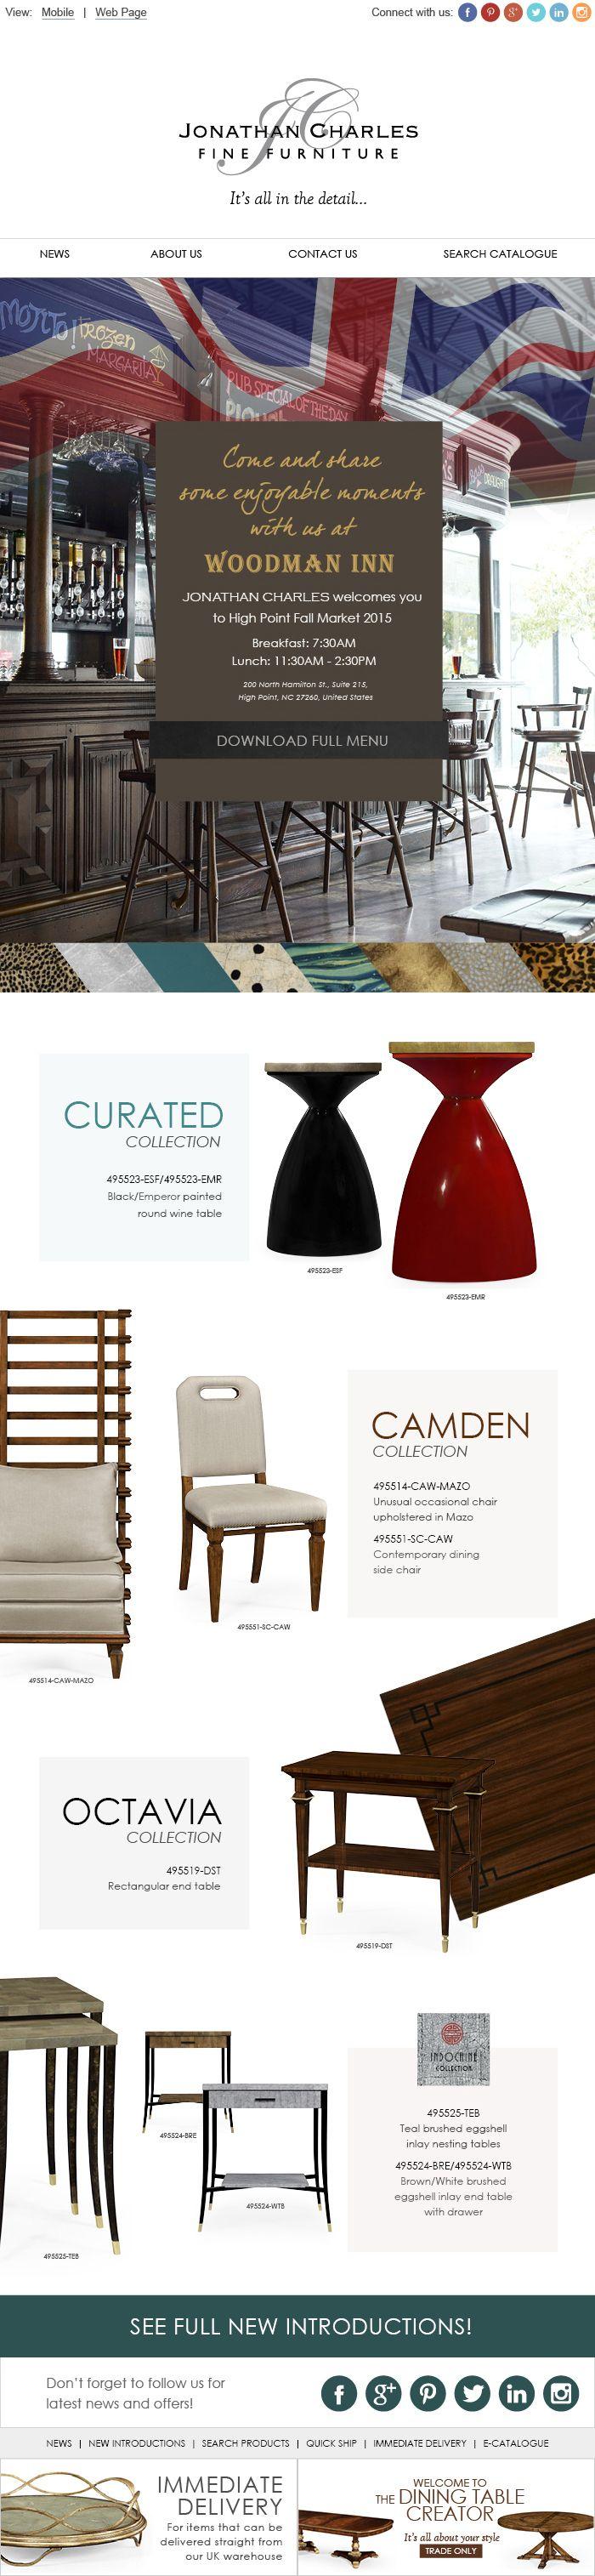 20 best the alexander julian collection images on pinterest invitation woodman inn jonathancharles furniture interiordesign decorex hpmkt